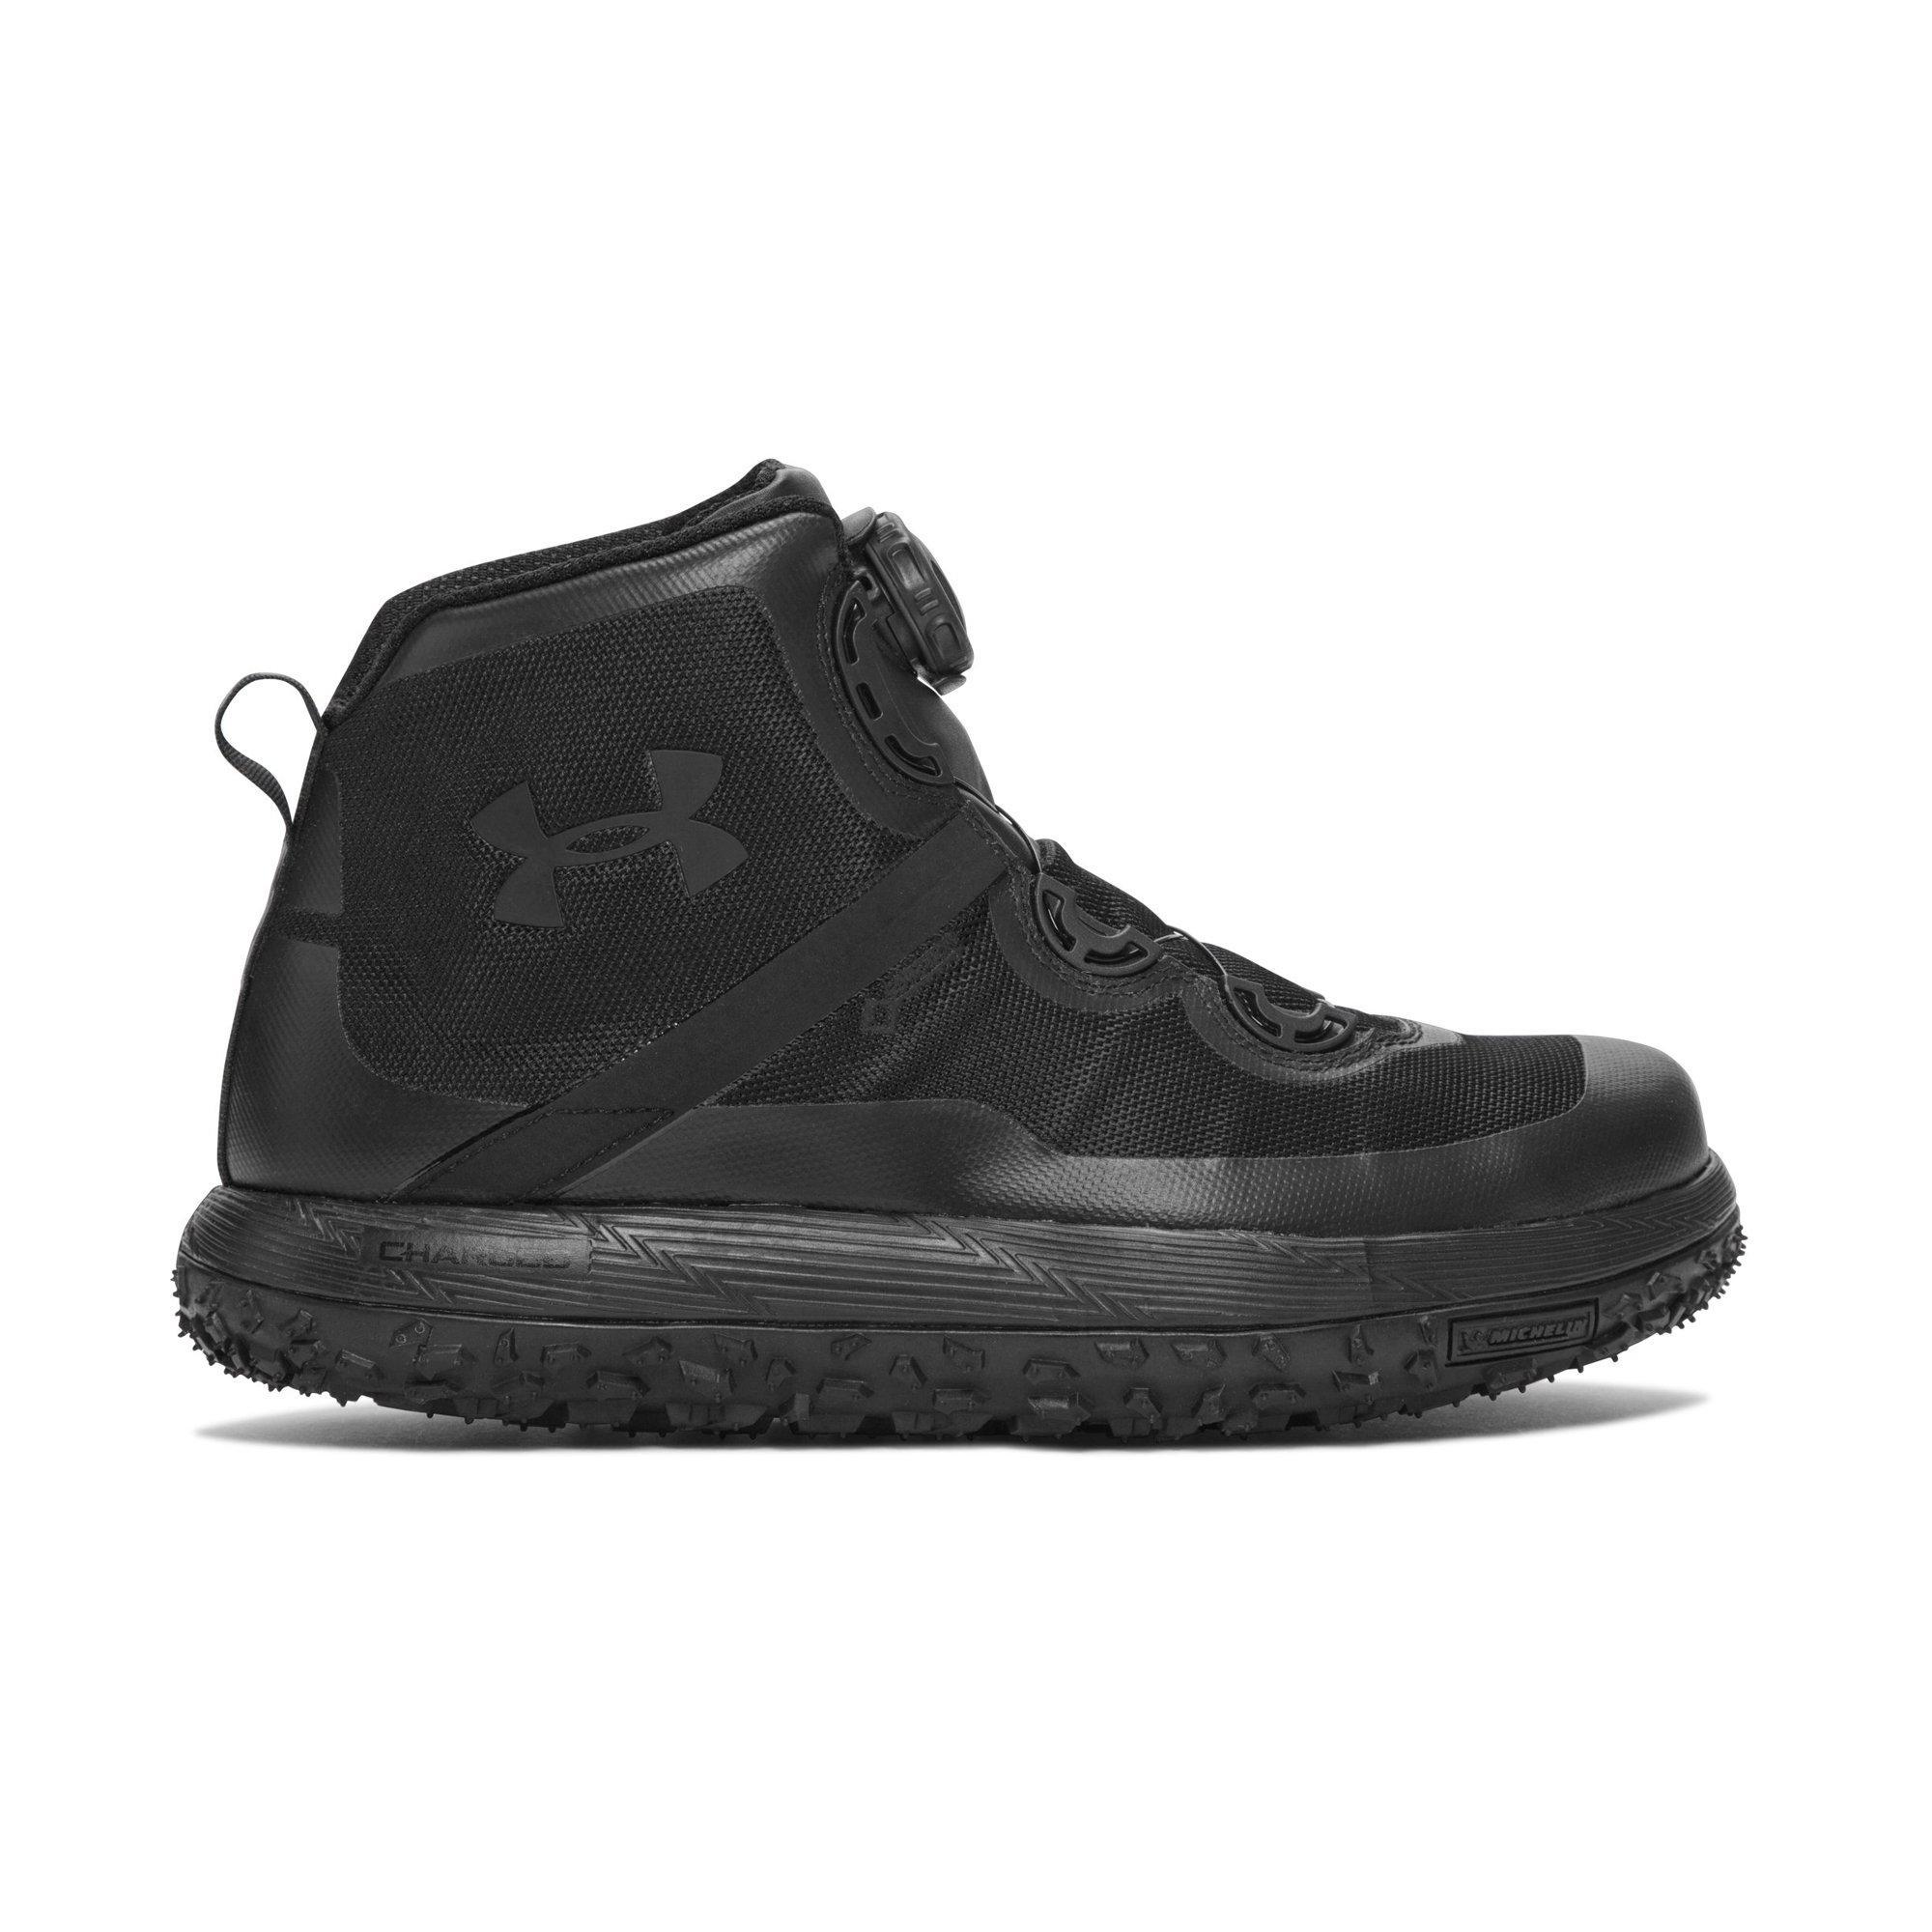 darse cuenta evitar Fraseología  Under Armour Fat Tire GORE-TEX Men's Hiking Boot - Hibbett   City Gear